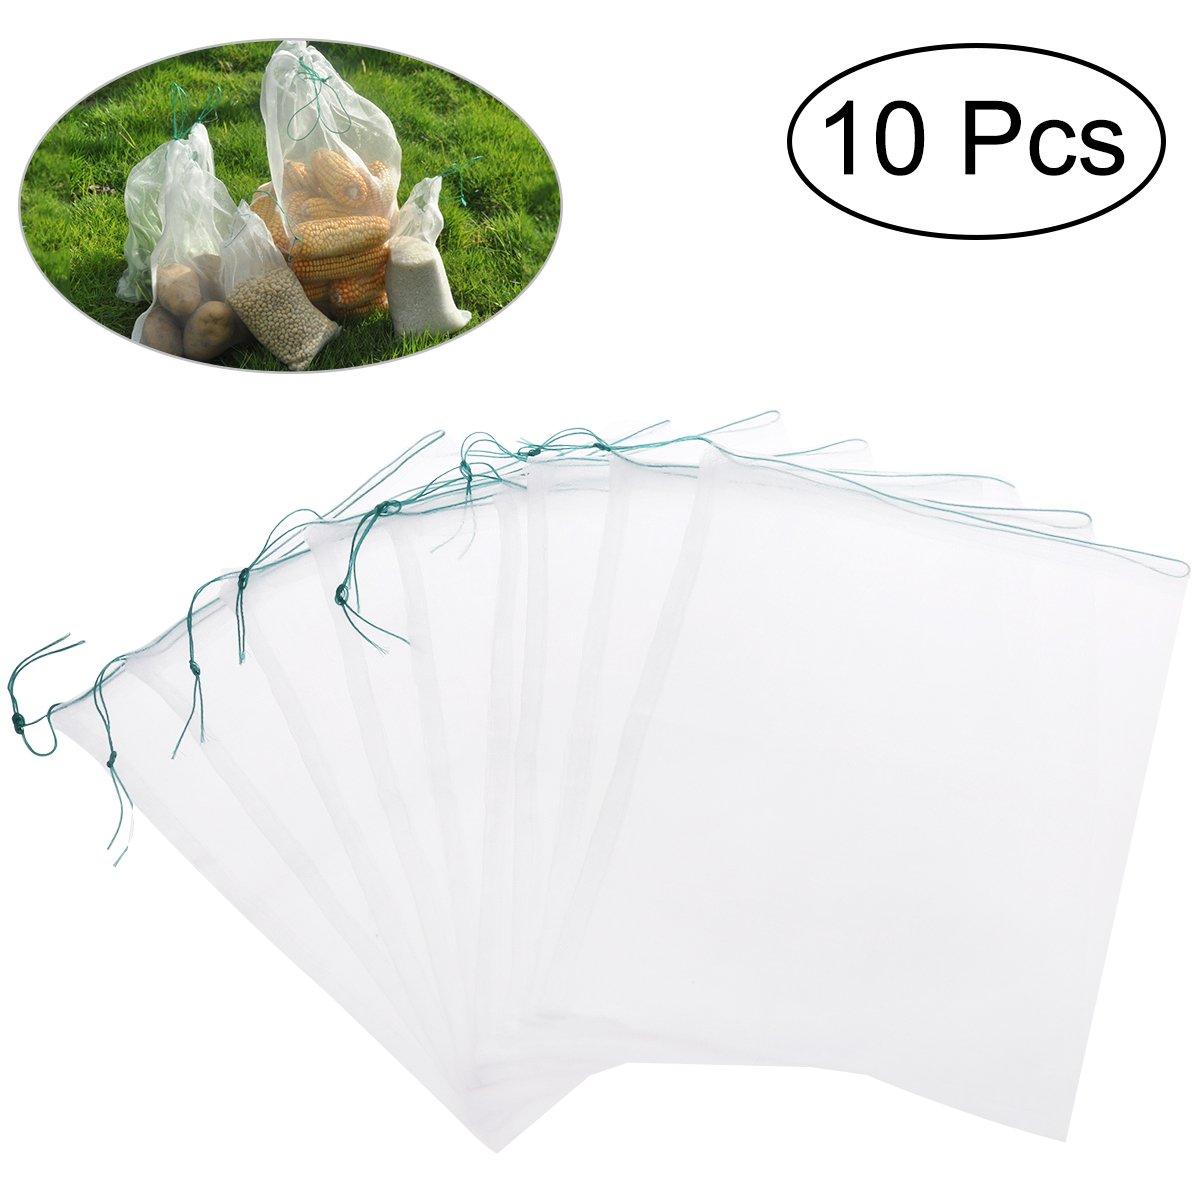 UEETEK Drawstring Nylon Mesh Filter Media Bag for Aquarium Garden Pond,10pcs